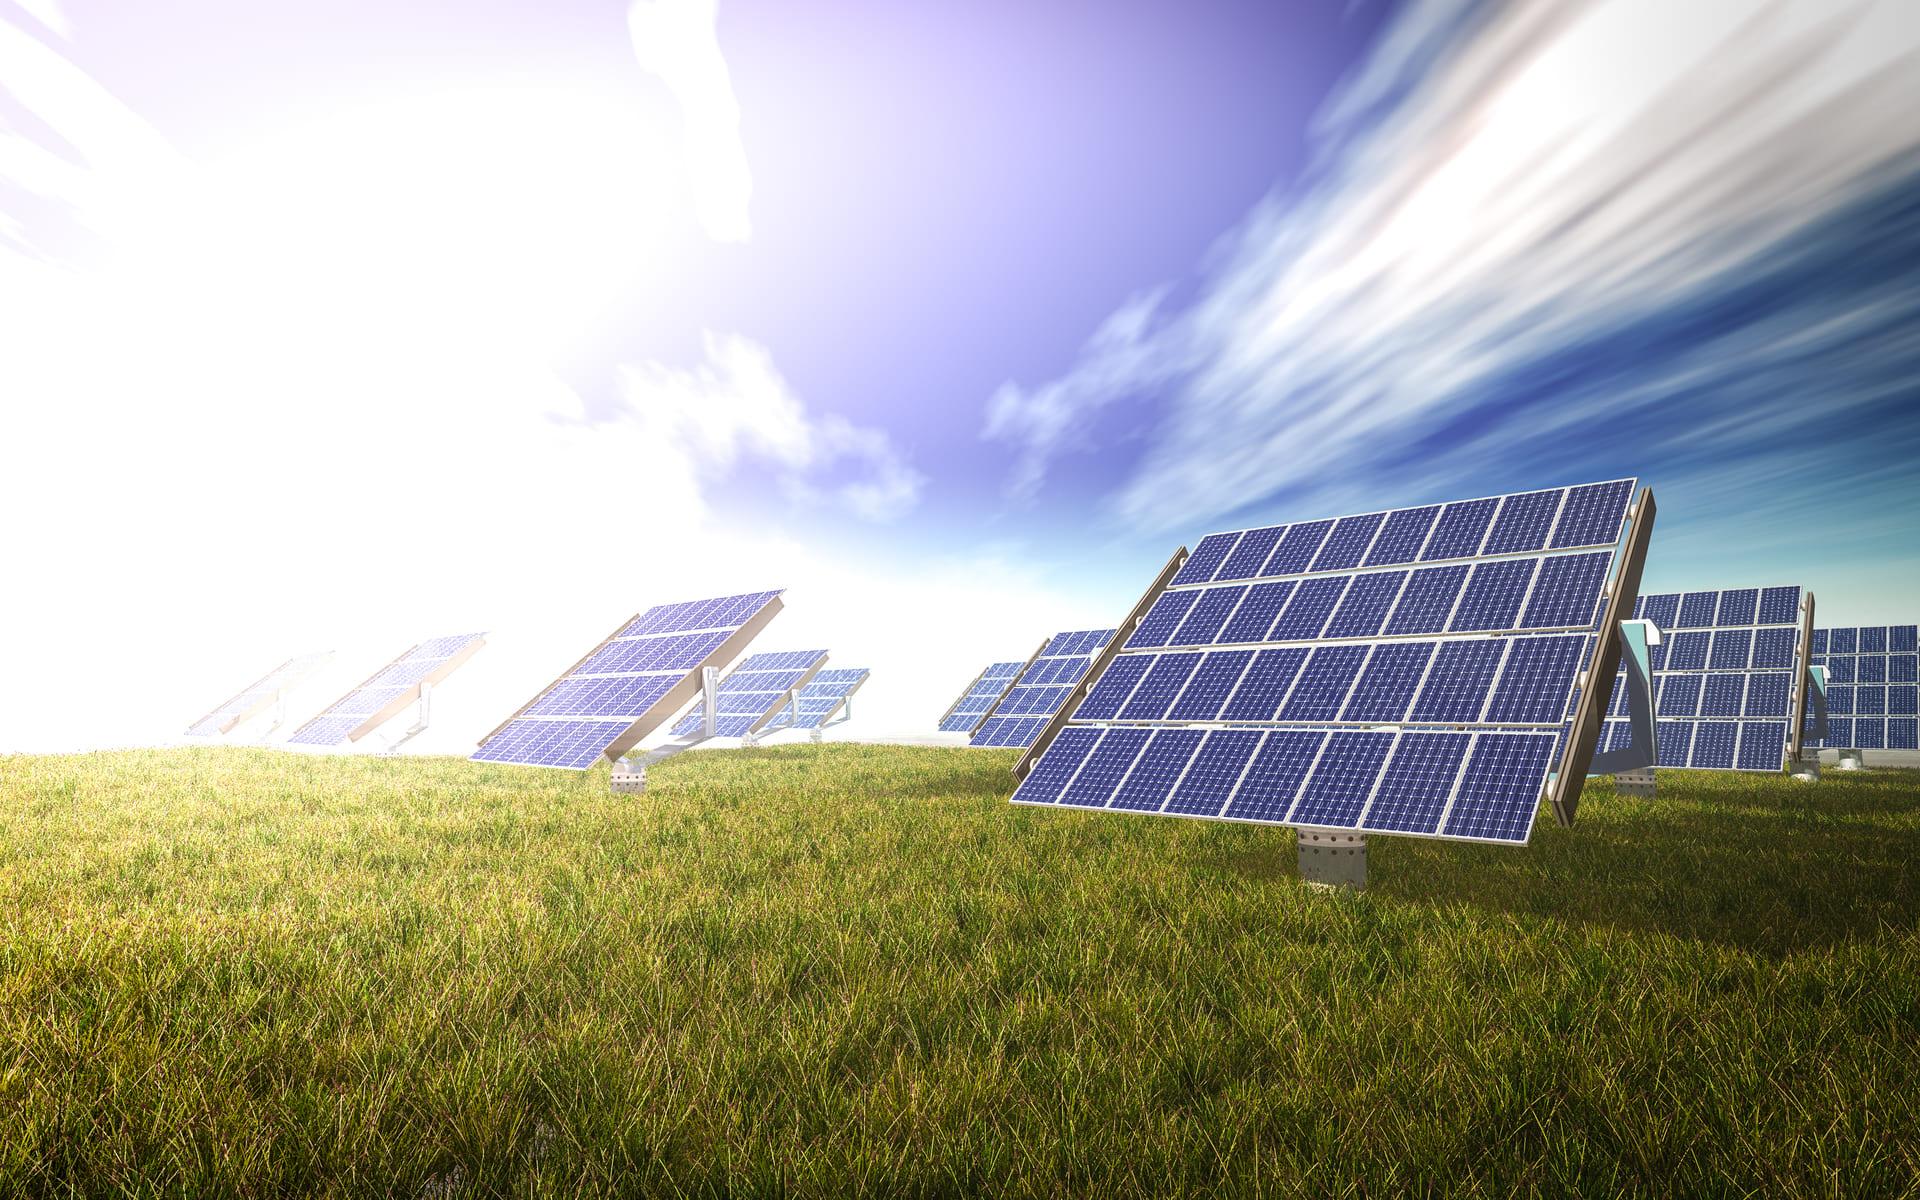 IMPIANTI SOLARI A ENERGIA TERMICA ED ELETTRICA GRATUITA PER TUTTI